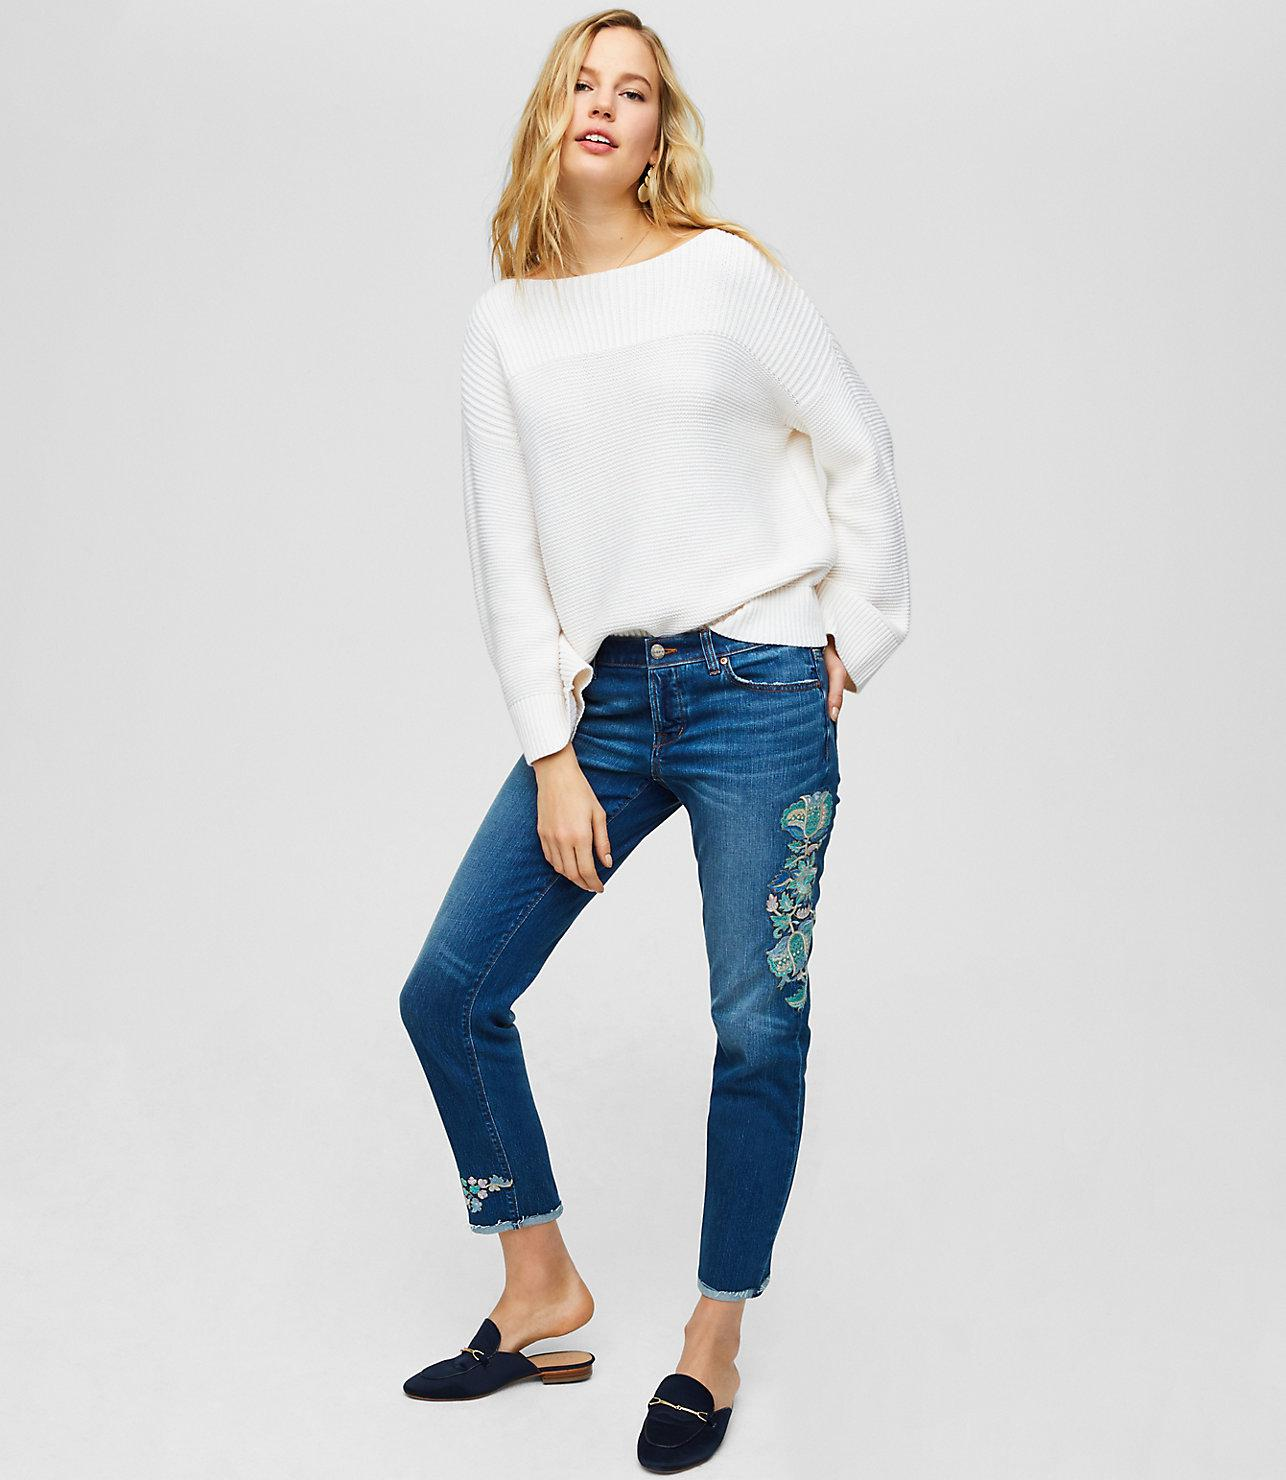 483d07938f64d Lyst - LOFT Floral Embroidered Boyfriend Jeans In Destructed Indigo ...